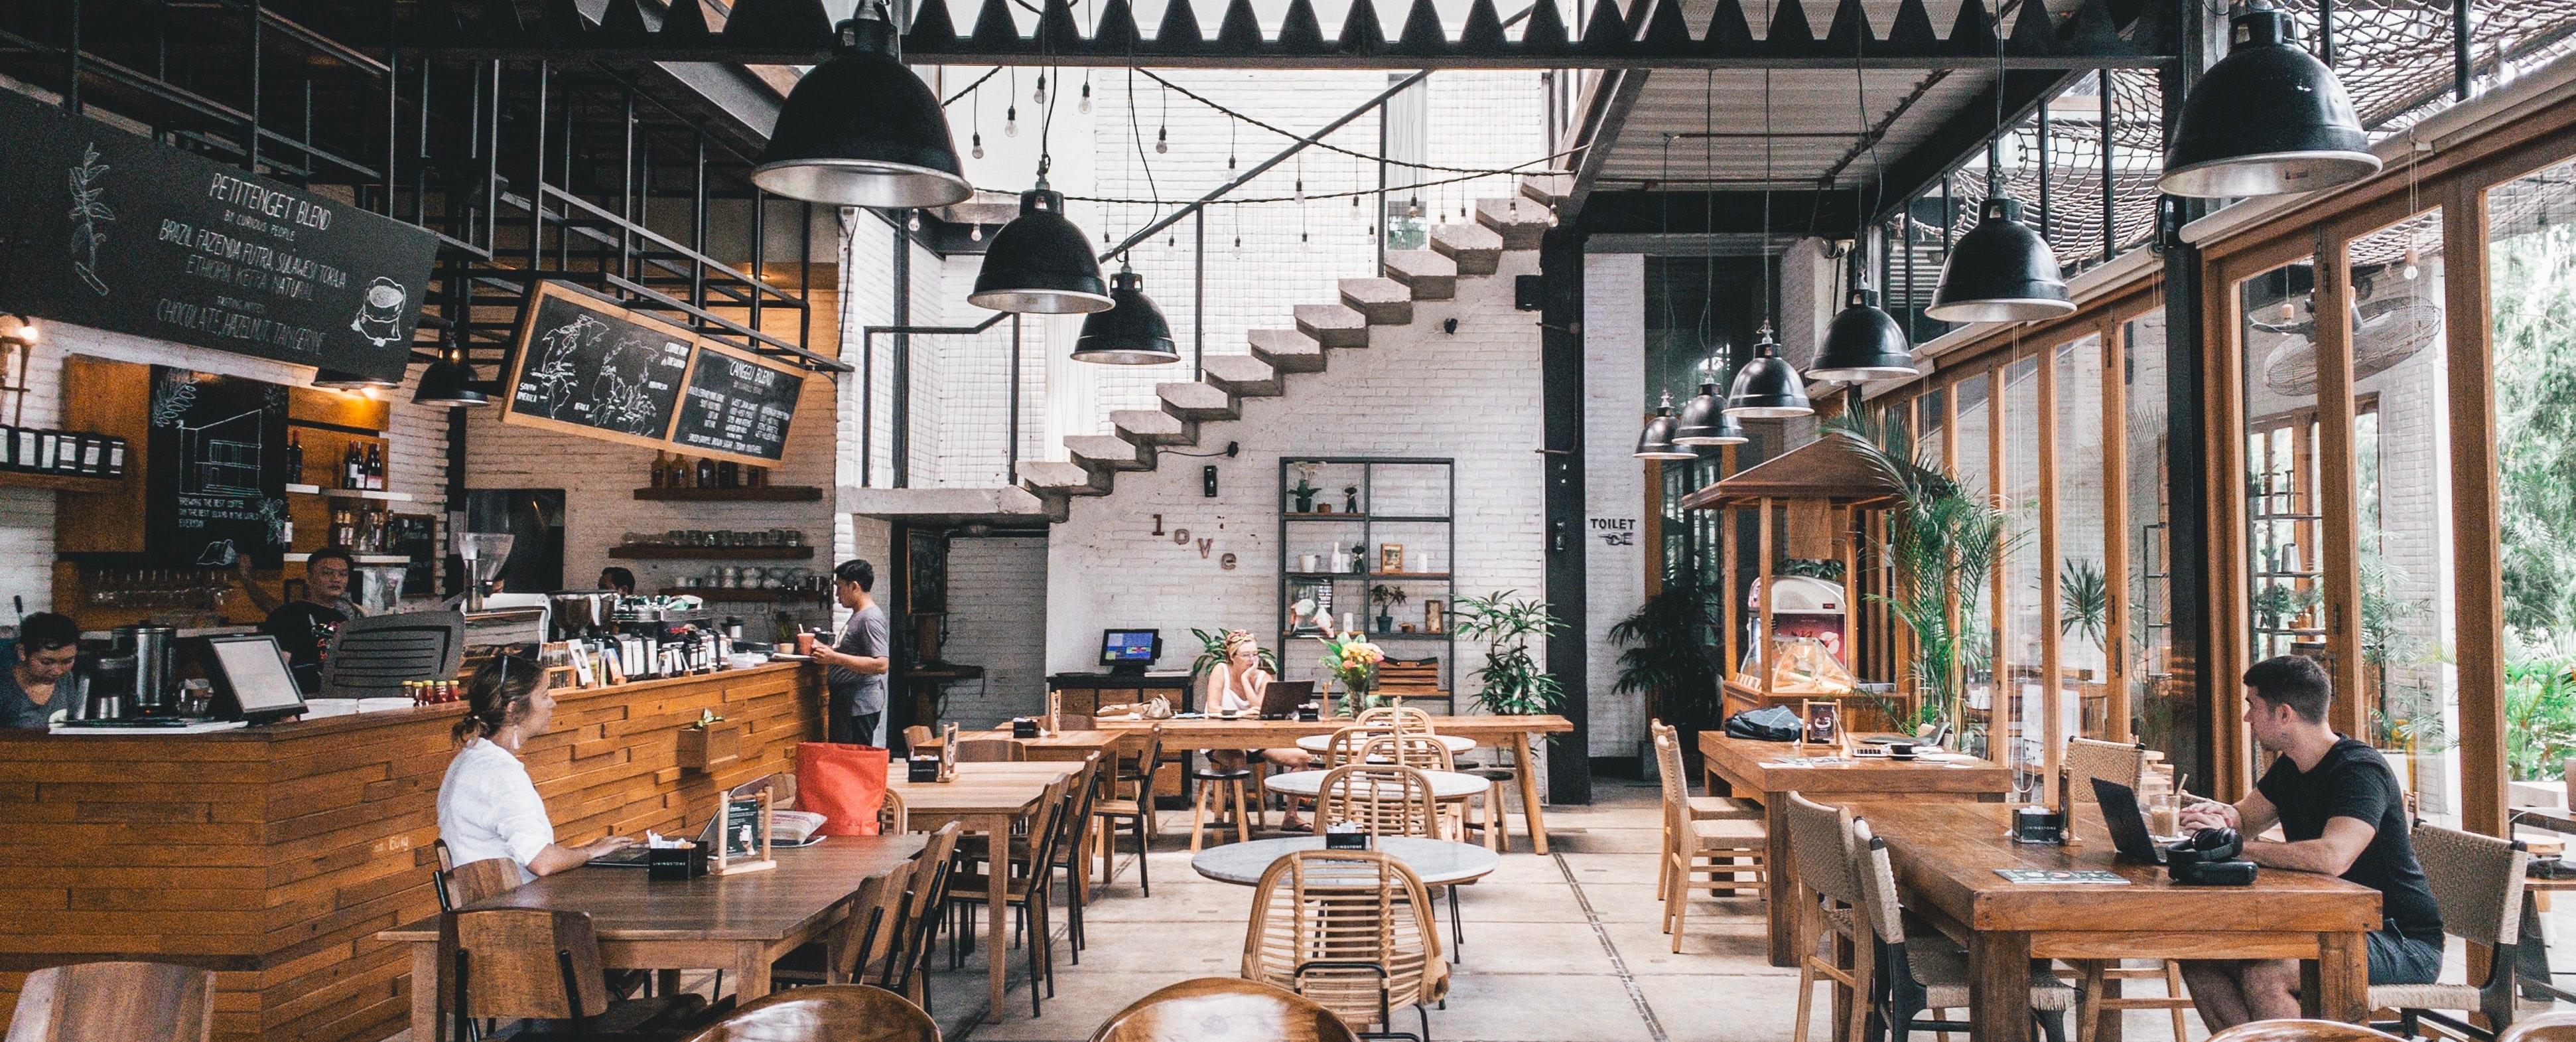 Employes salarisadministratie restaurants